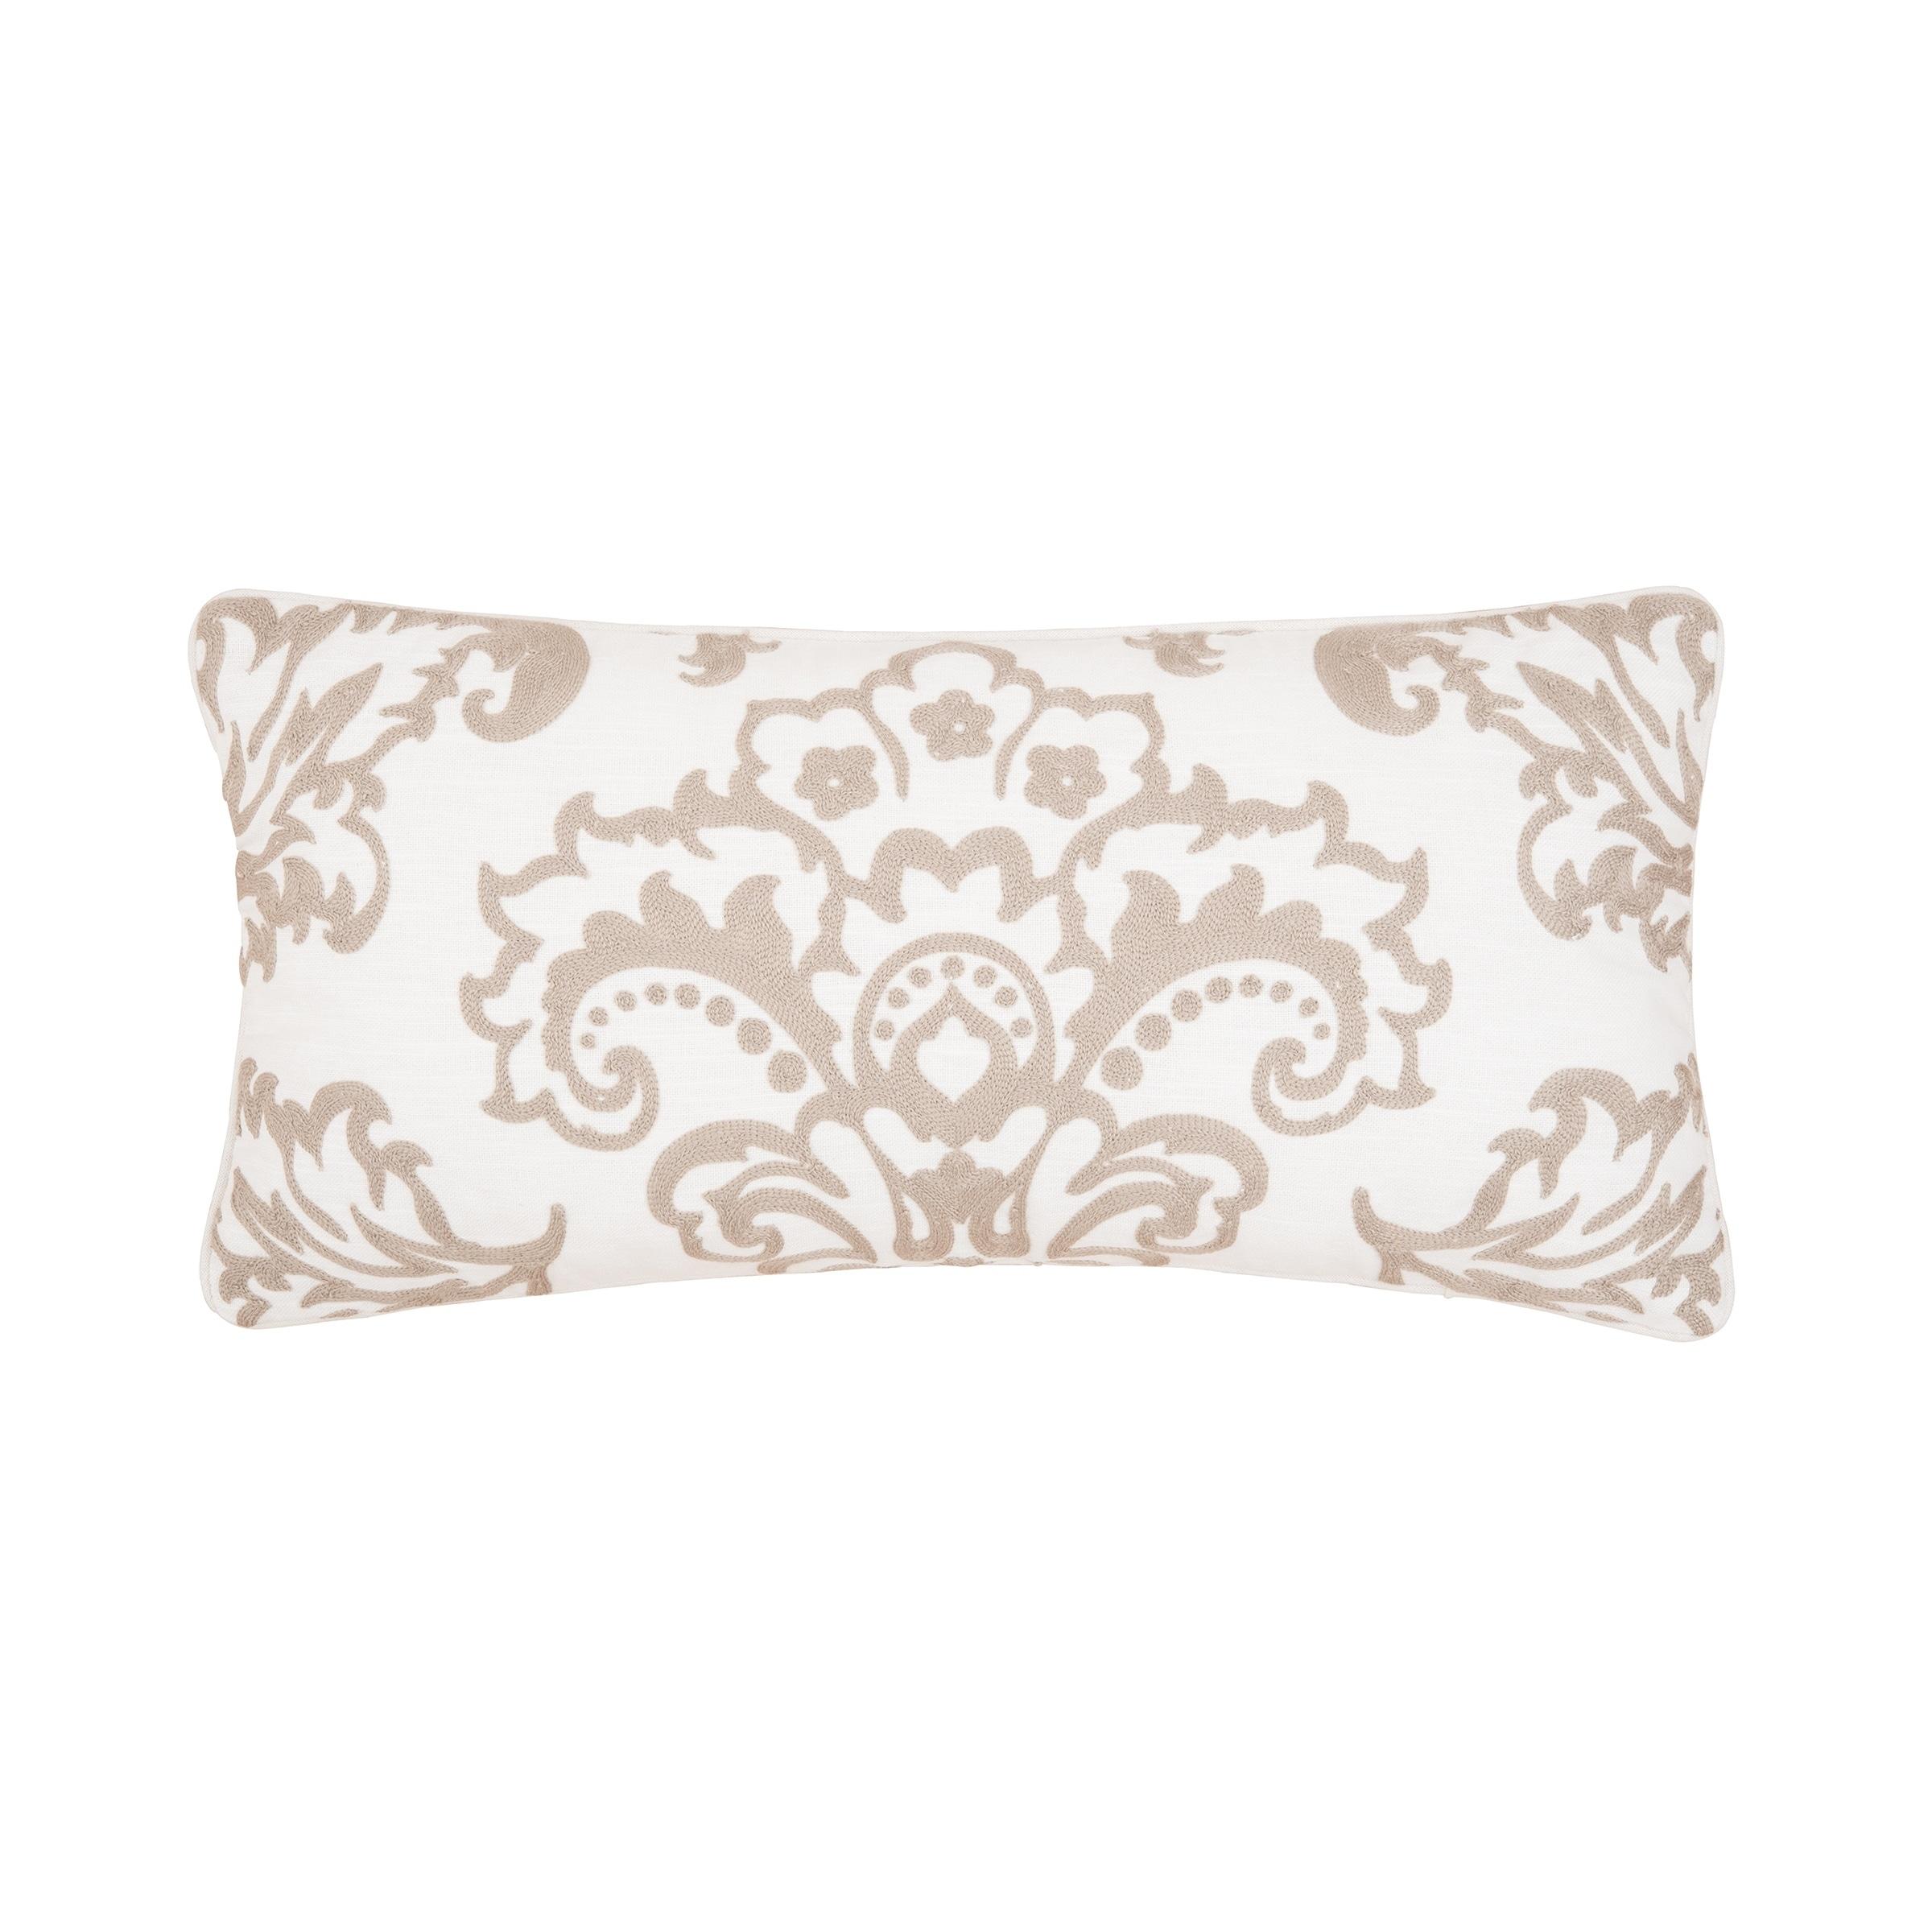 Rosamund Damask 12 x 24 Pillow